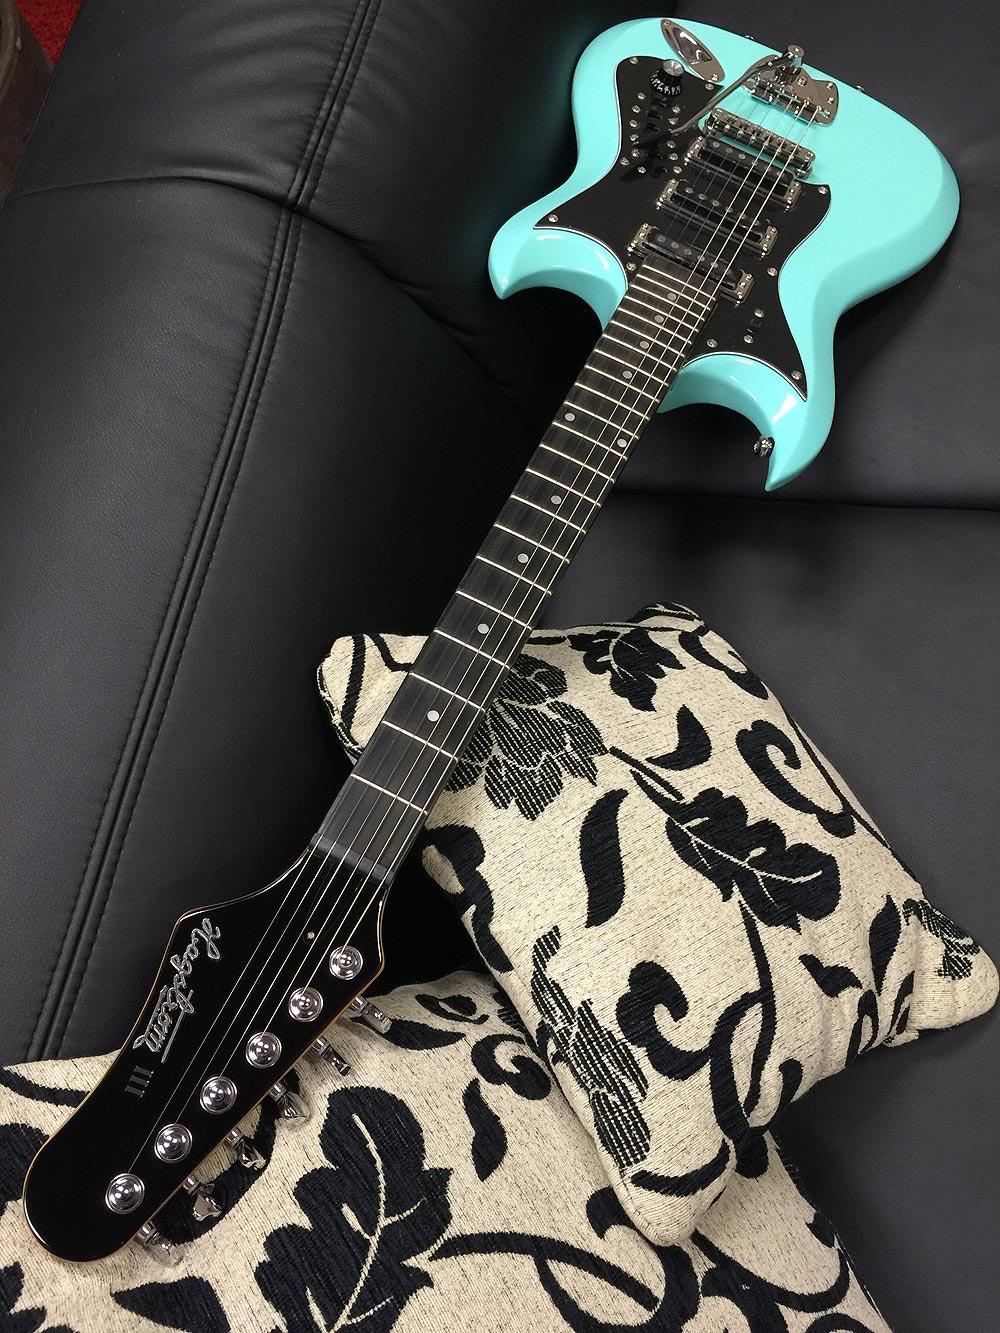 Hagstrom 6 String Electric Guitar, Aged Sky Blue (HII-ABE) by Hagstrom